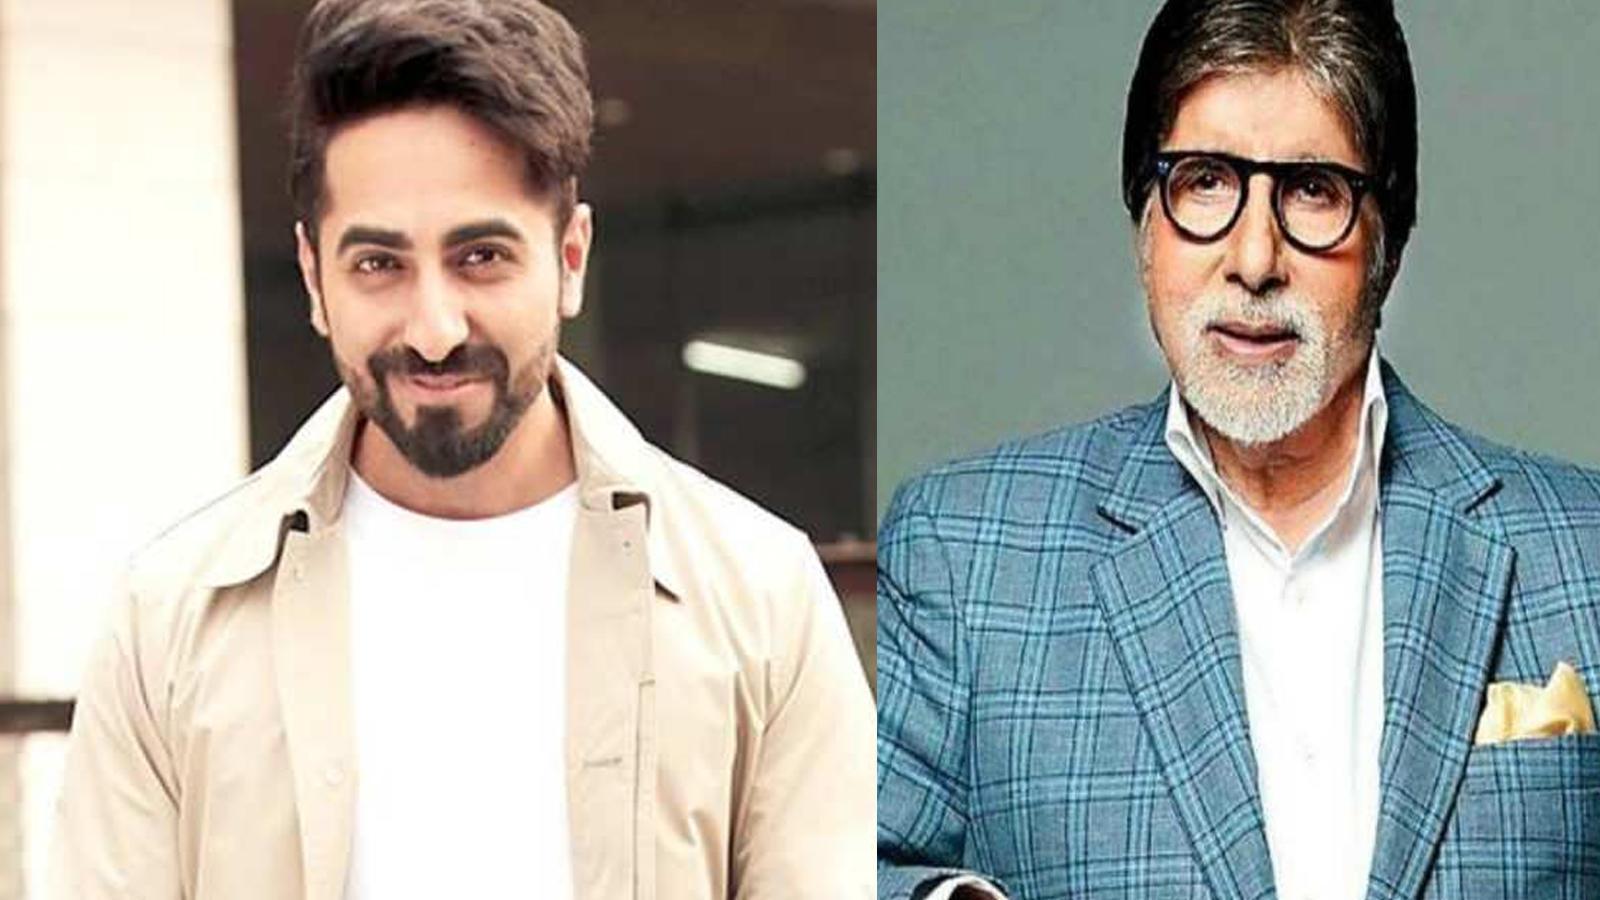 Amitabh Bachchan, Ayushmann Khurrana coming together for comedy film 'Gulabo Sitabo'